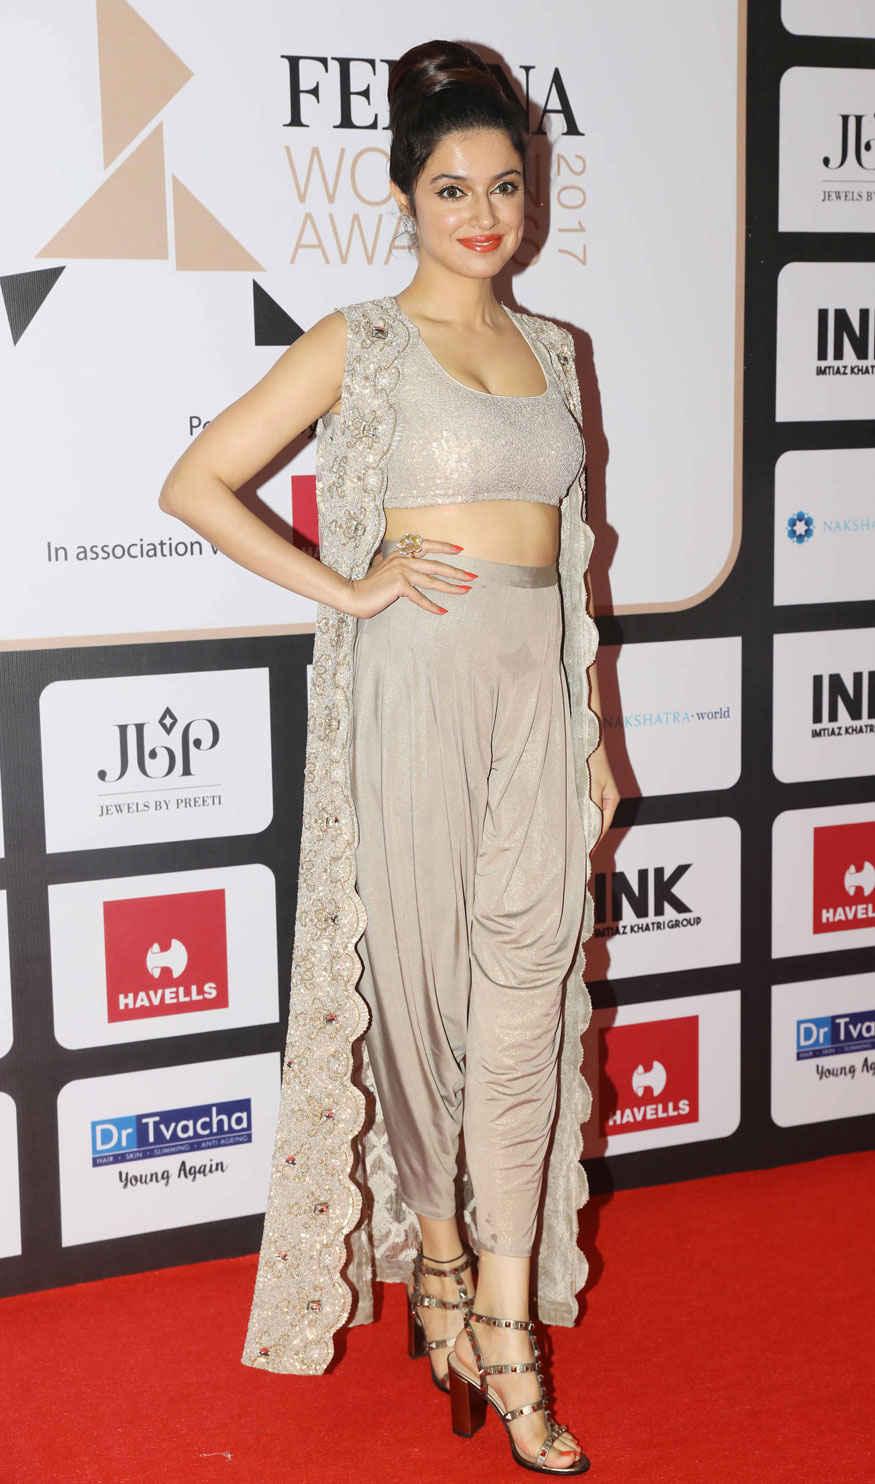 Bollywood Celebs Attend Femina Women Awards 2017 Photo Gallery